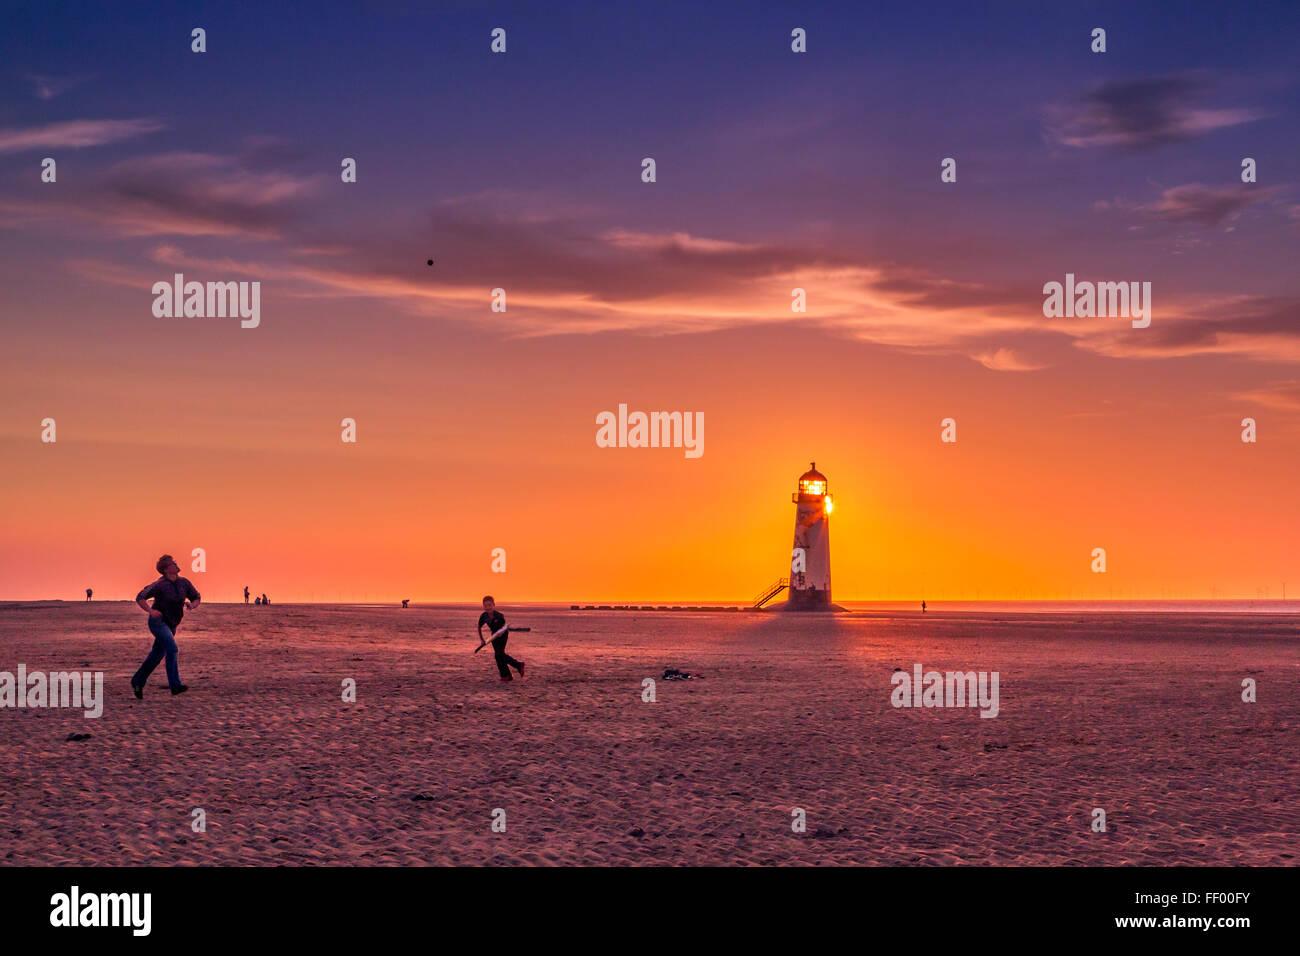 Jugar cricket Talacre playa playa al atardecer. Imagen De Stock